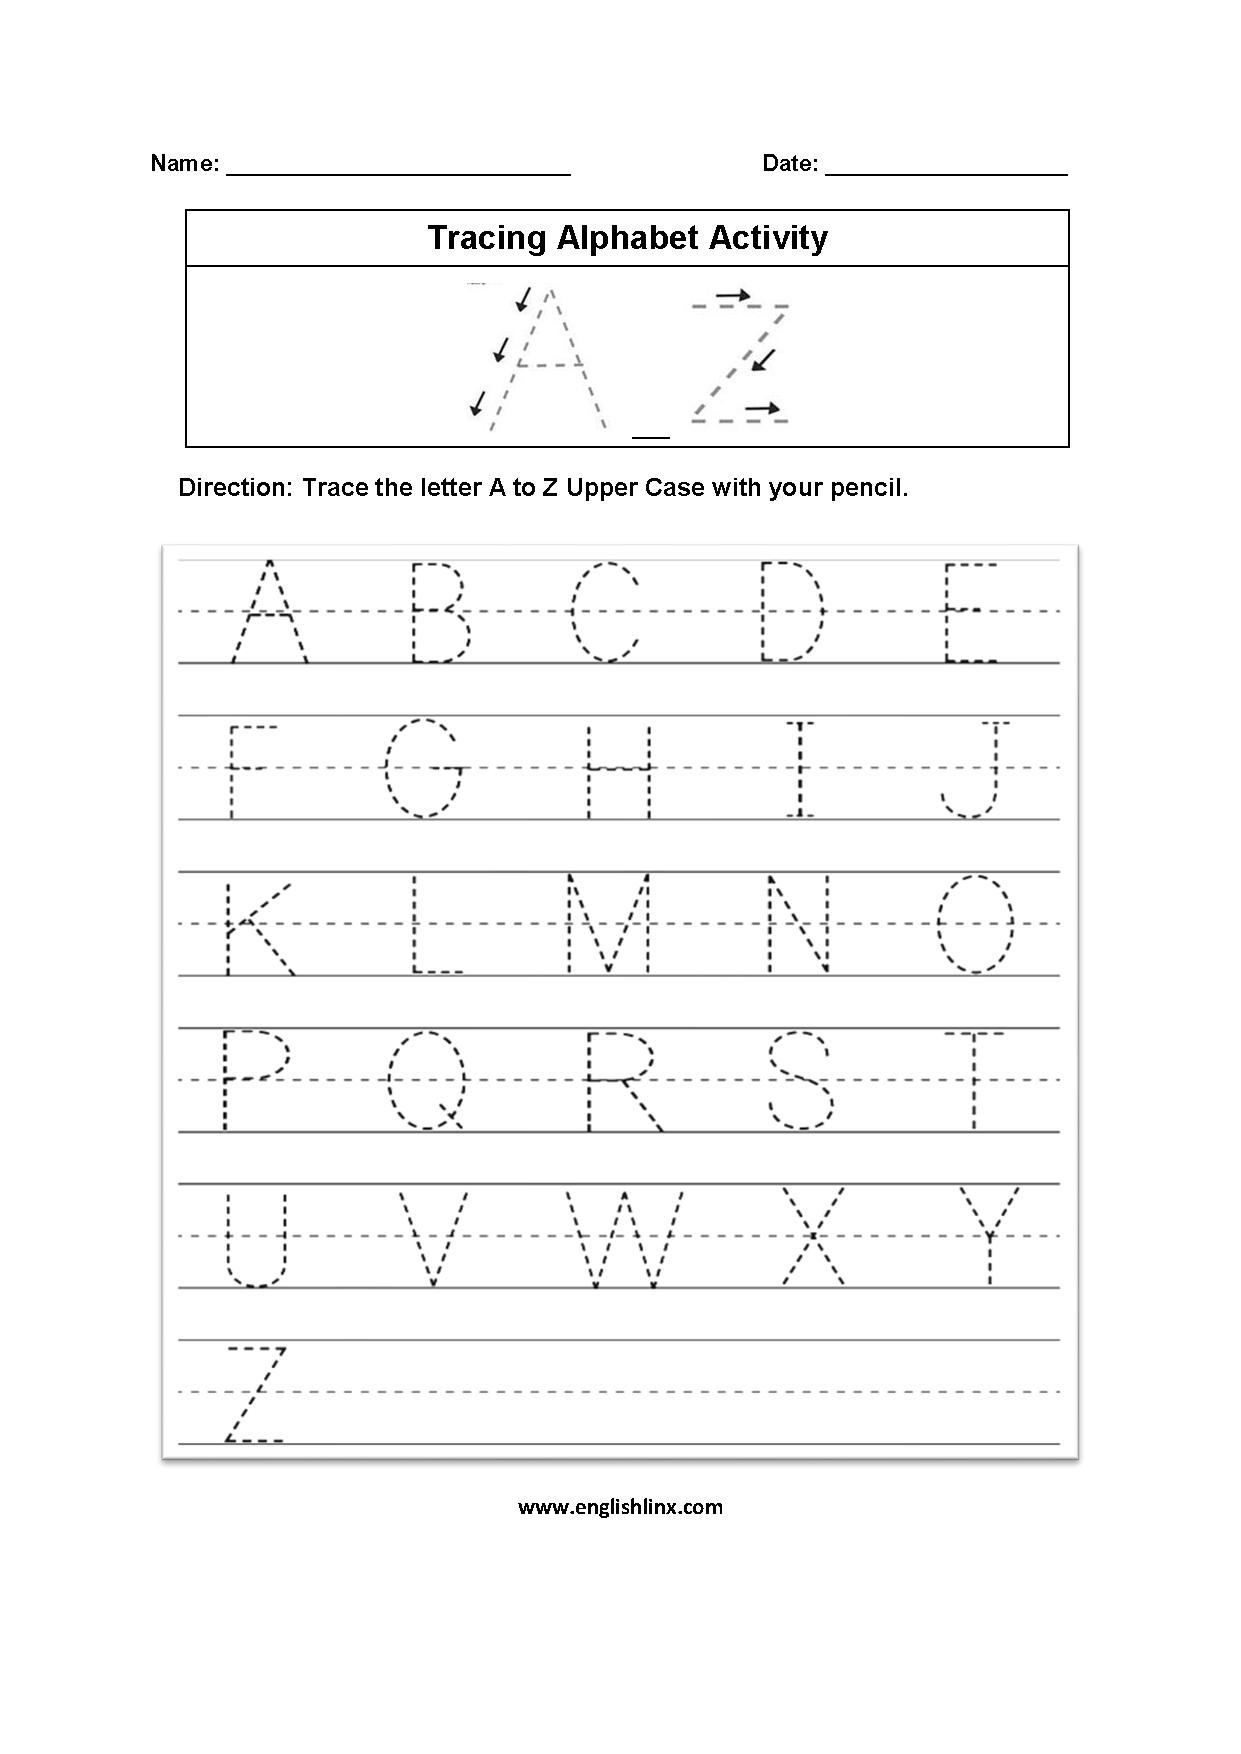 Worksheets : Practice Writing Alphabettters Worksheets To with Tracing Letters Worksheets Printable